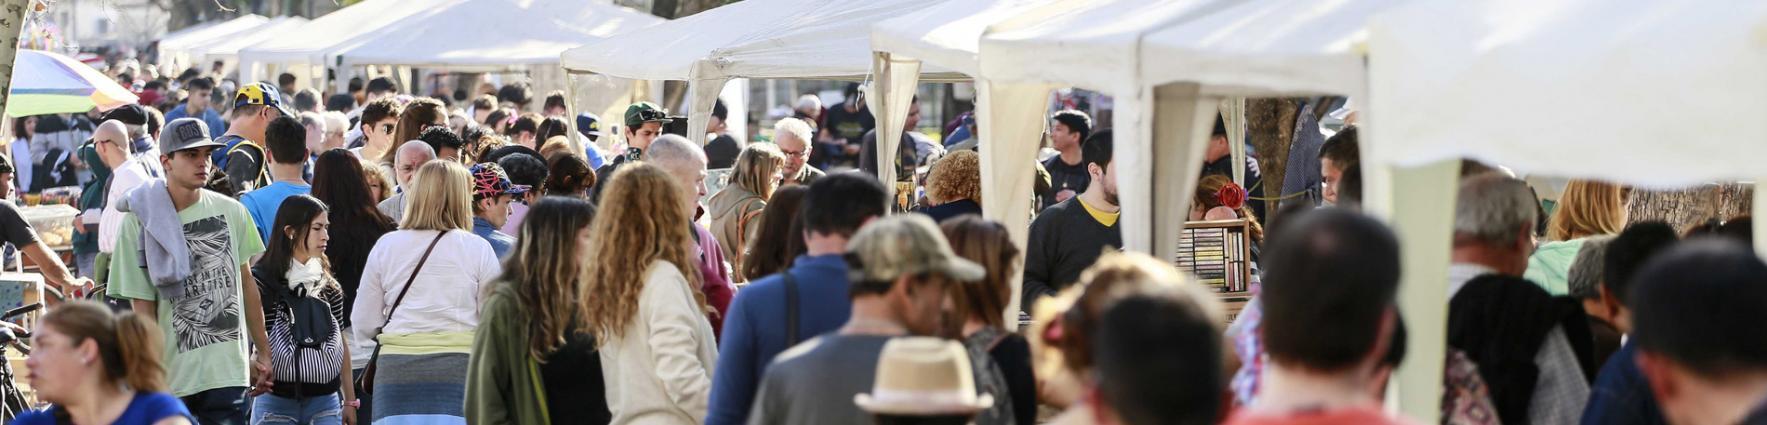 Feria de Artesanos del Bulevar